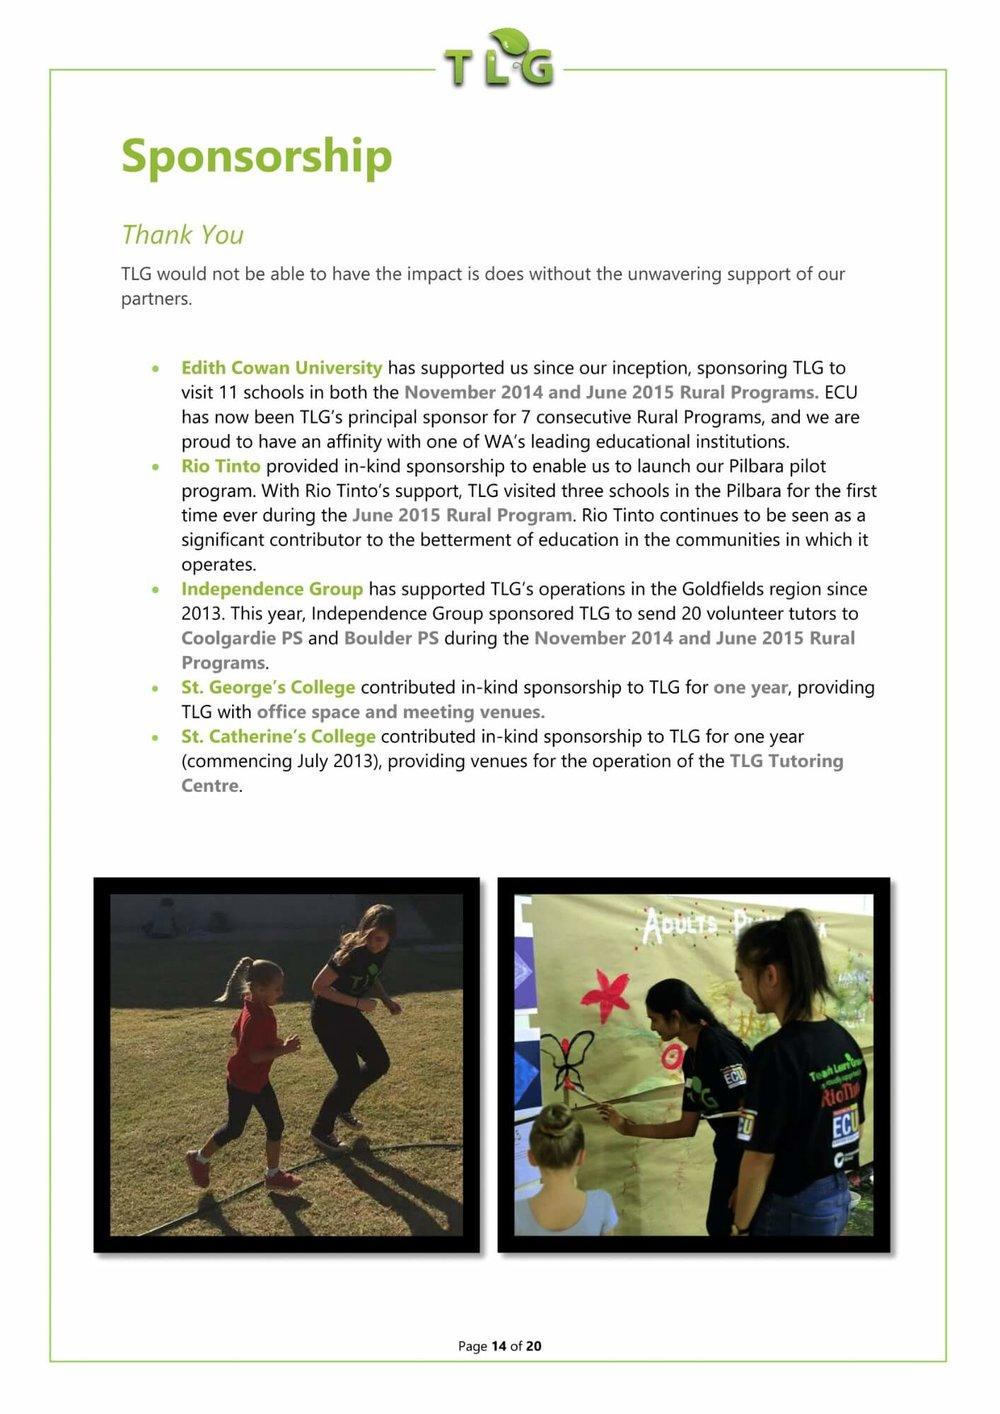 tlg-annual-report-FY14-14.jpg